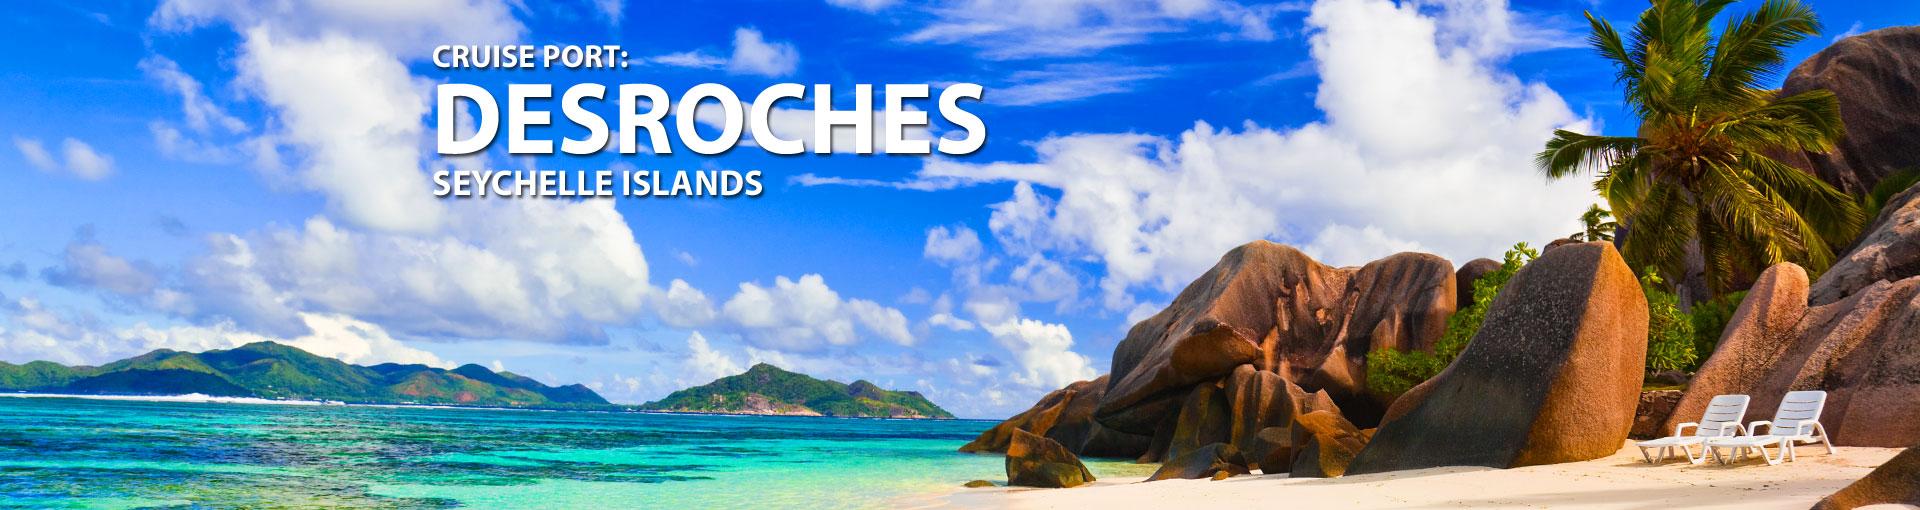 Cruises to Desroches, Seychelle Islands